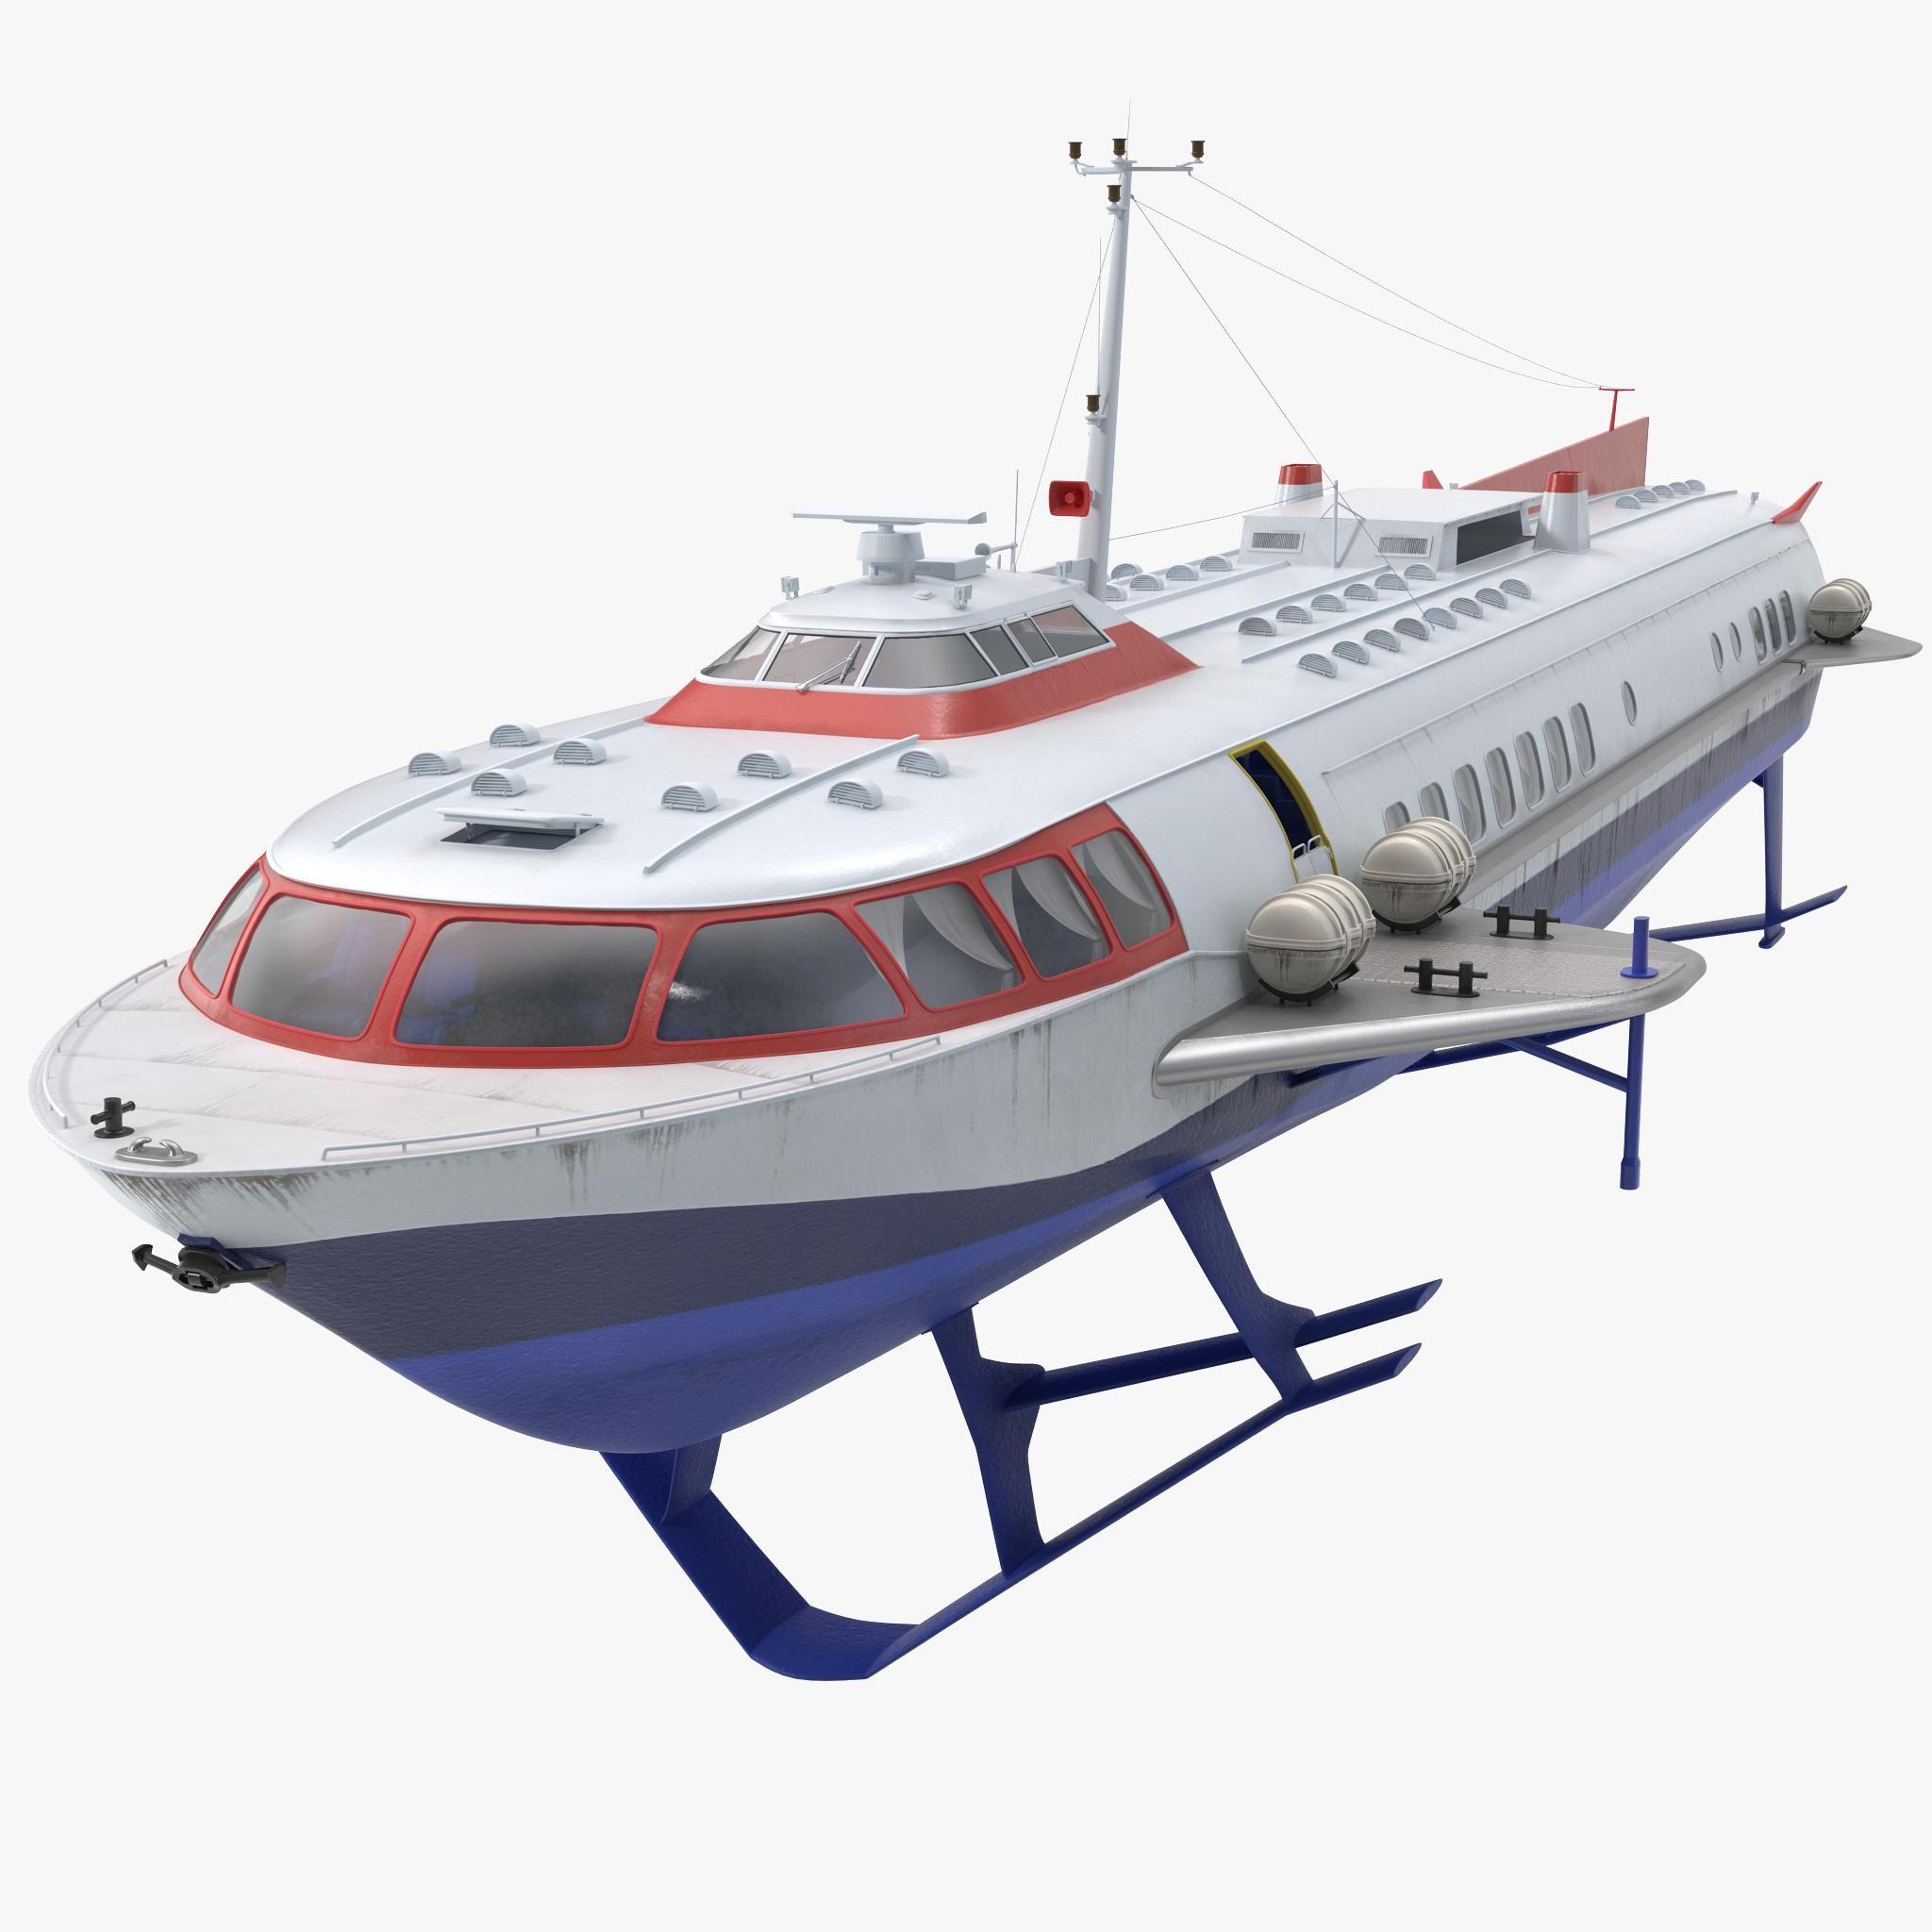 Passenger Hydrofoil Boat 3d Model Ad Hydrofoil Passenger Model Boat Model Boats Amphibious Vehicle Boat